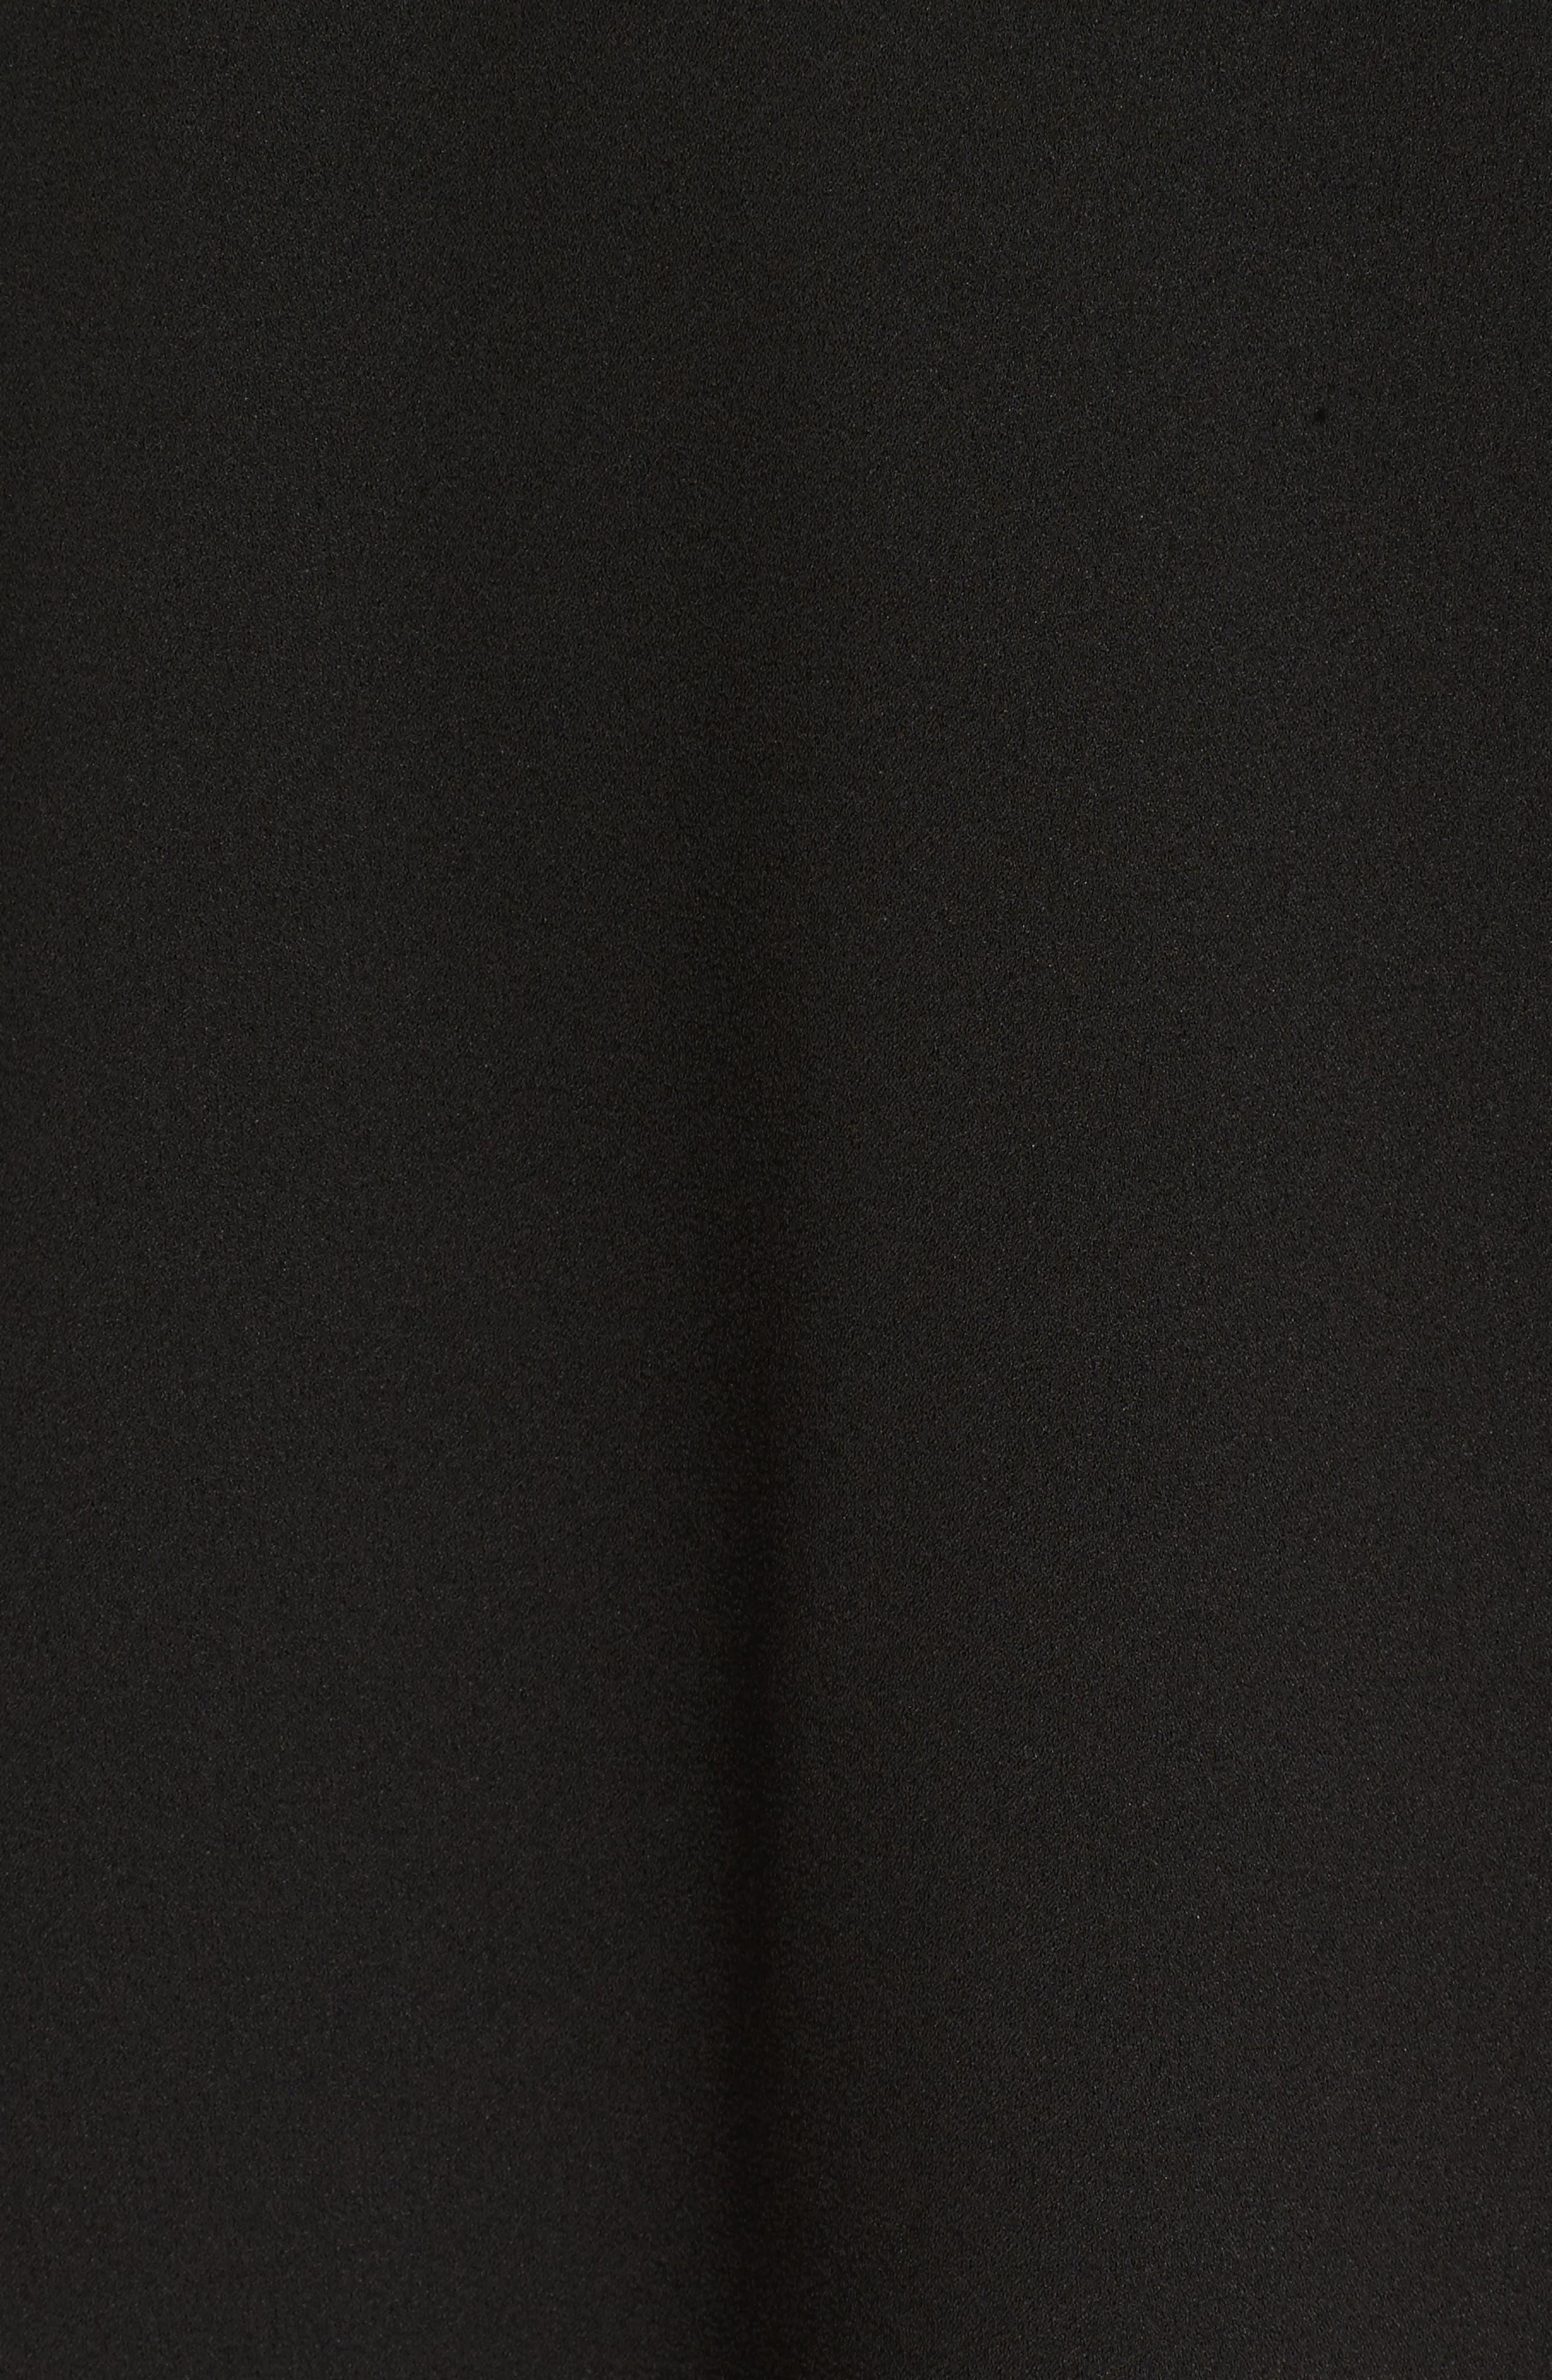 Signe Ruffle A-Line Dress,                             Alternate thumbnail 5, color,                             001